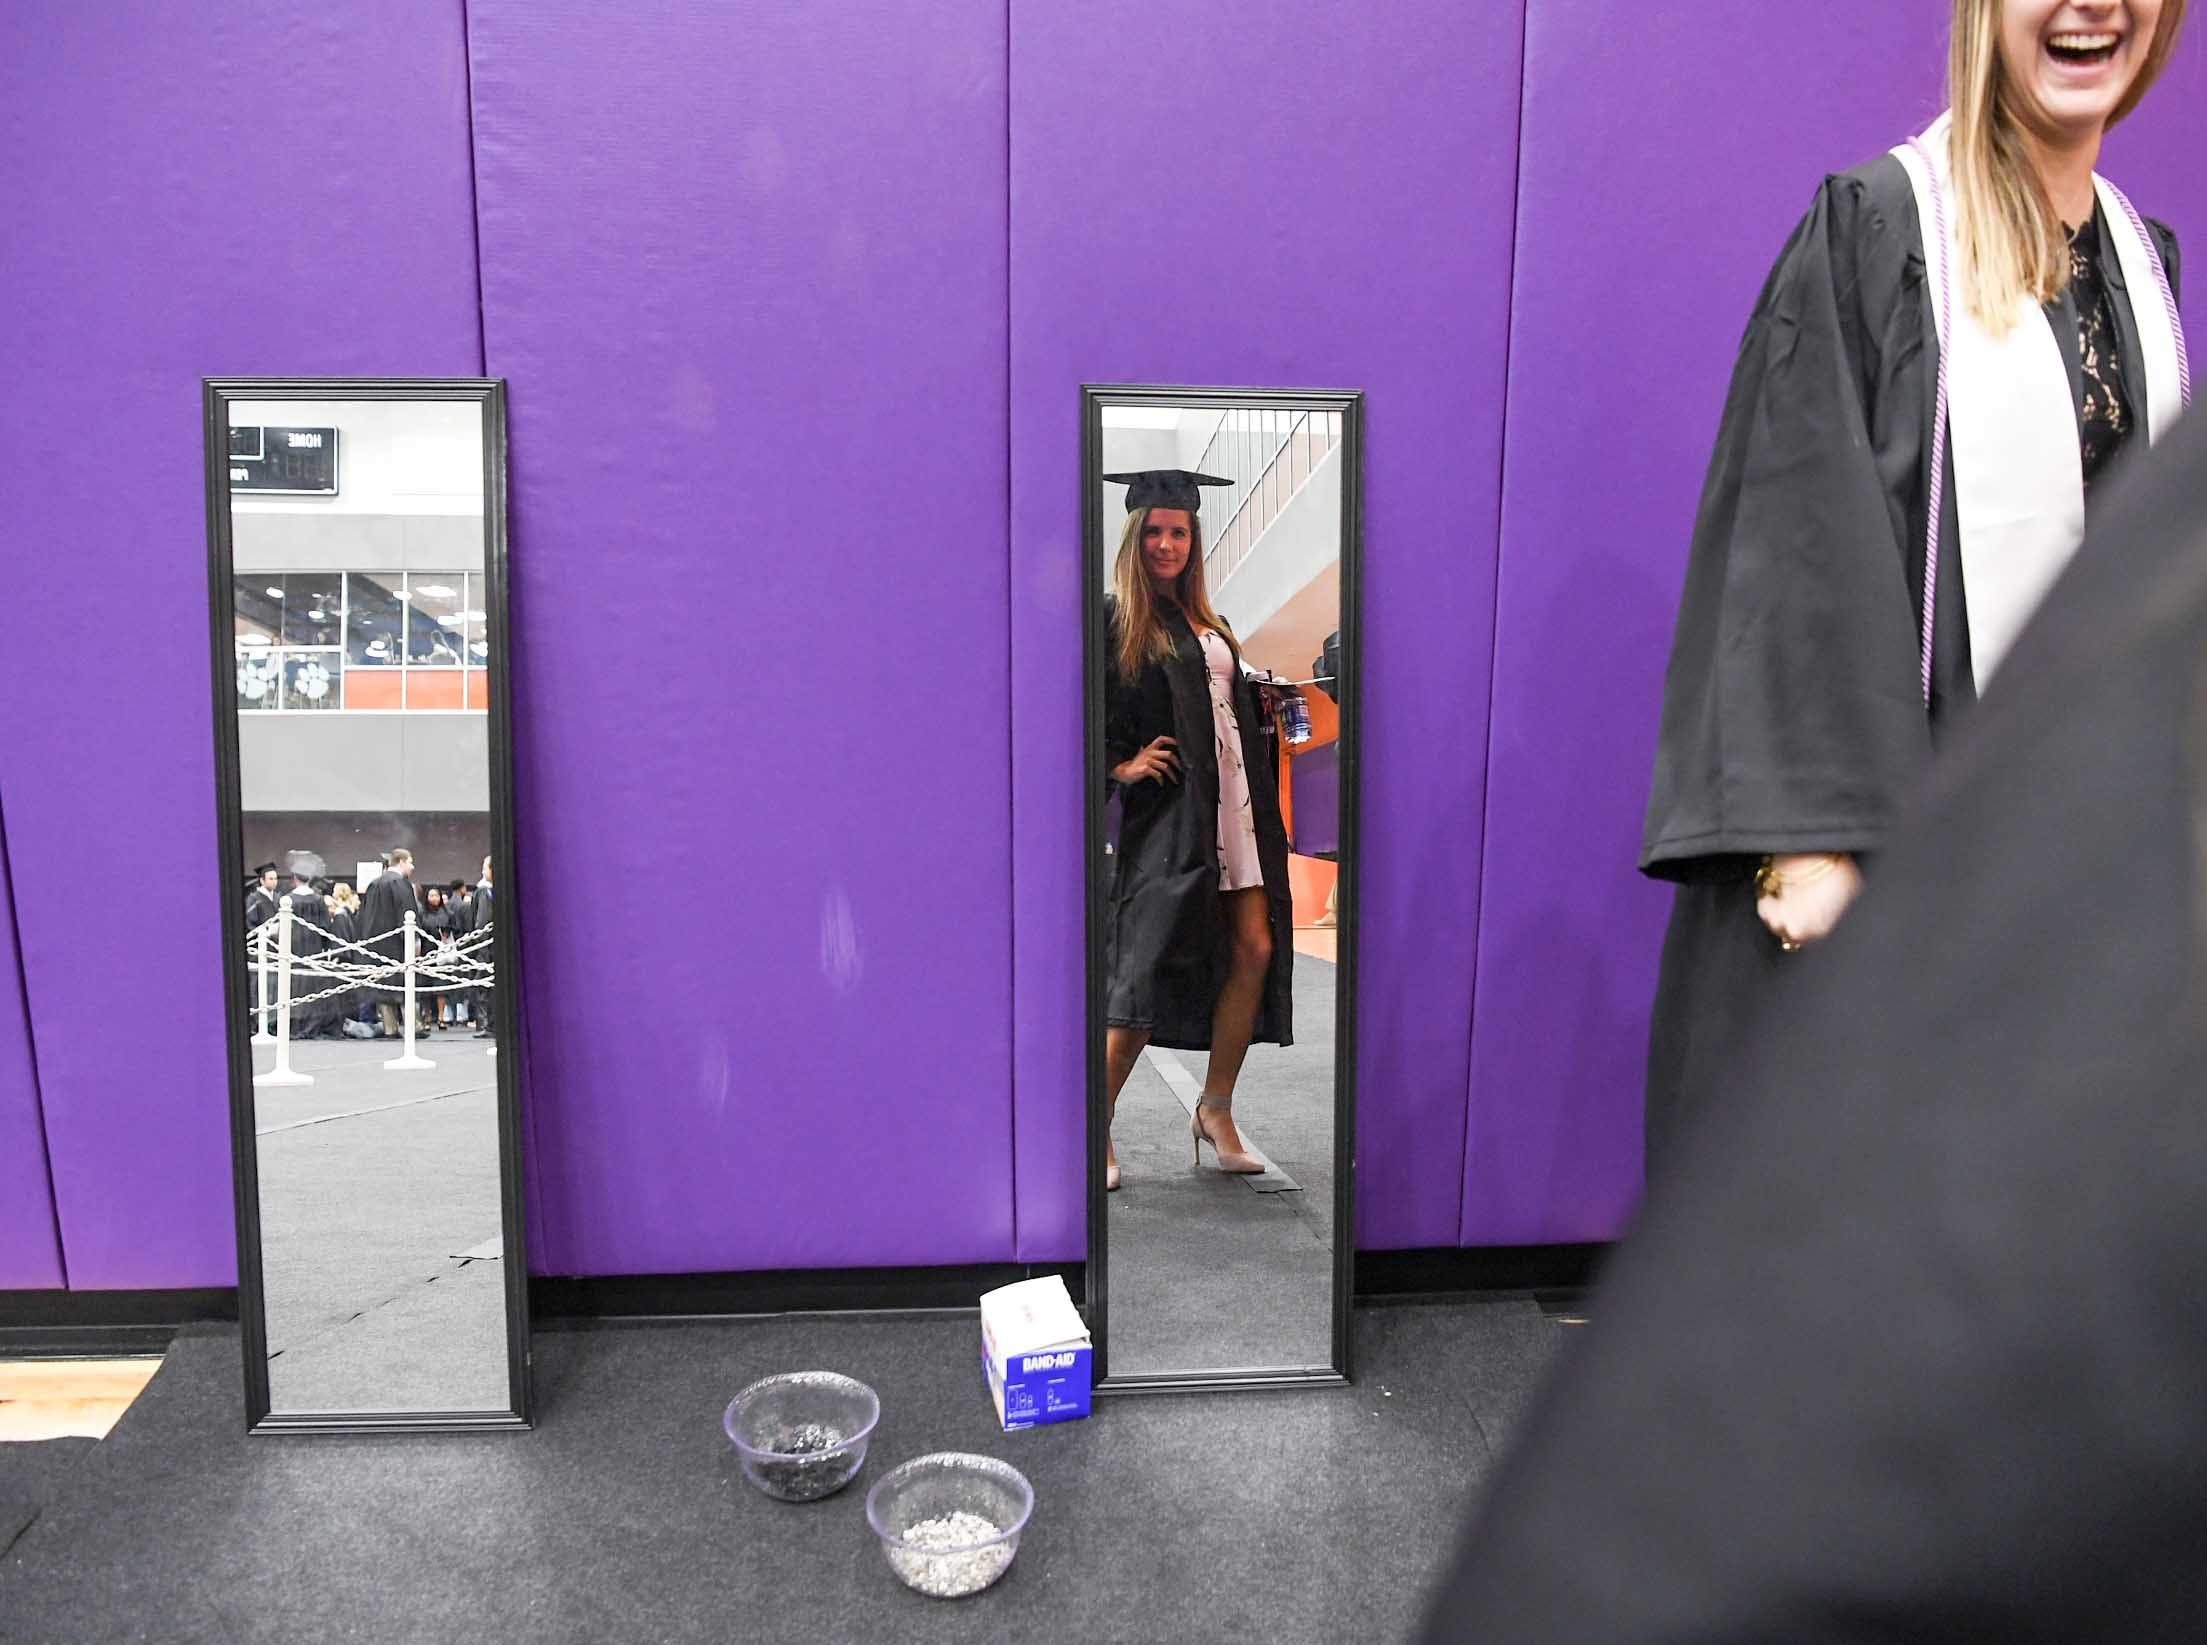 Natalie Feagin of Murrels Inlet looks in the mirror before the morning Clemson University graduation ceremony Thursday morning in Littlejohn Coliseum in Clemson.